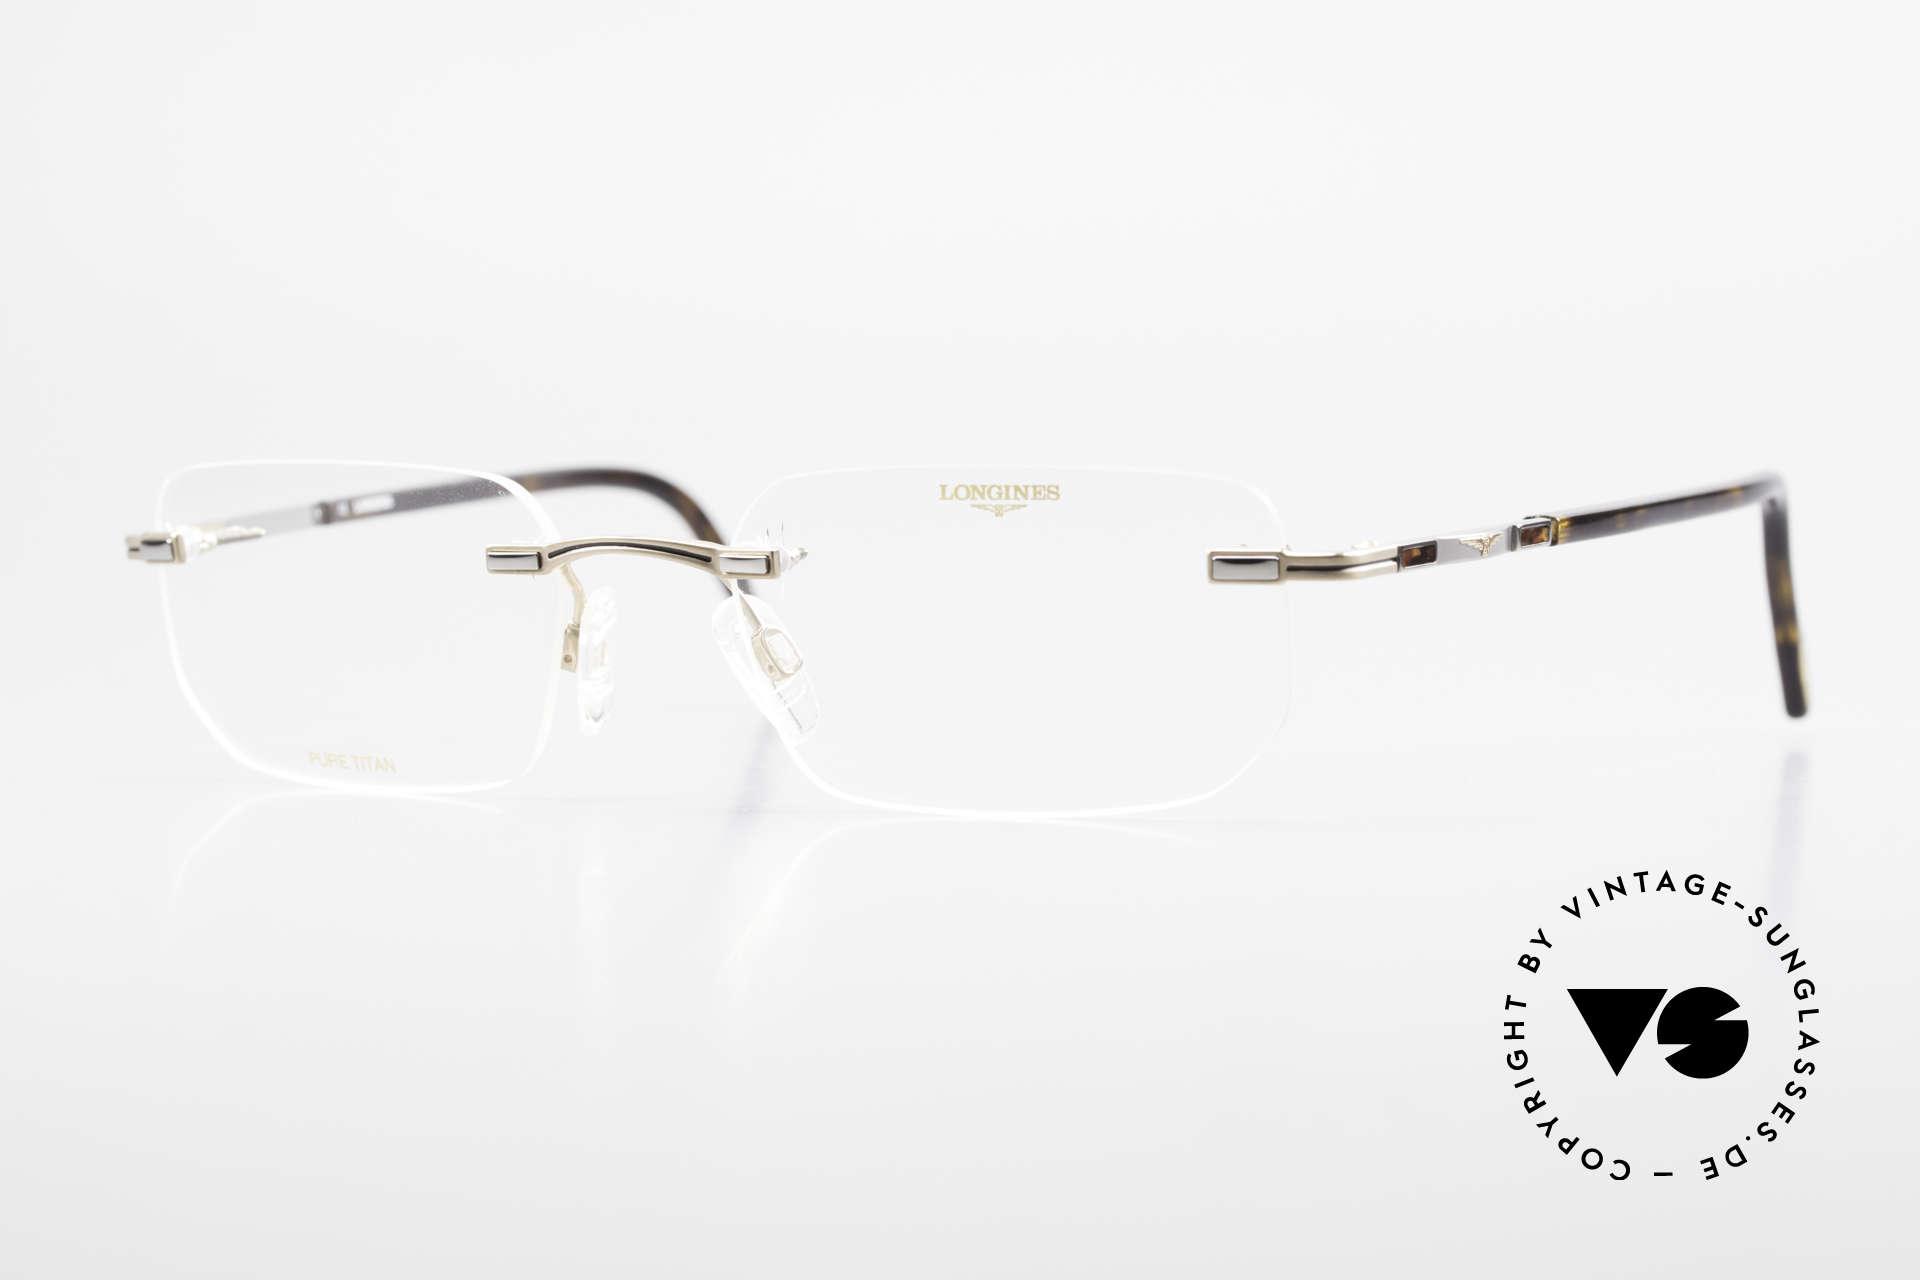 Longines 4238 90er Randlosbrille Pure Titan, randlose 90er Brille v. Longines, Pure Titan Herrenbrille, Passend für Herren